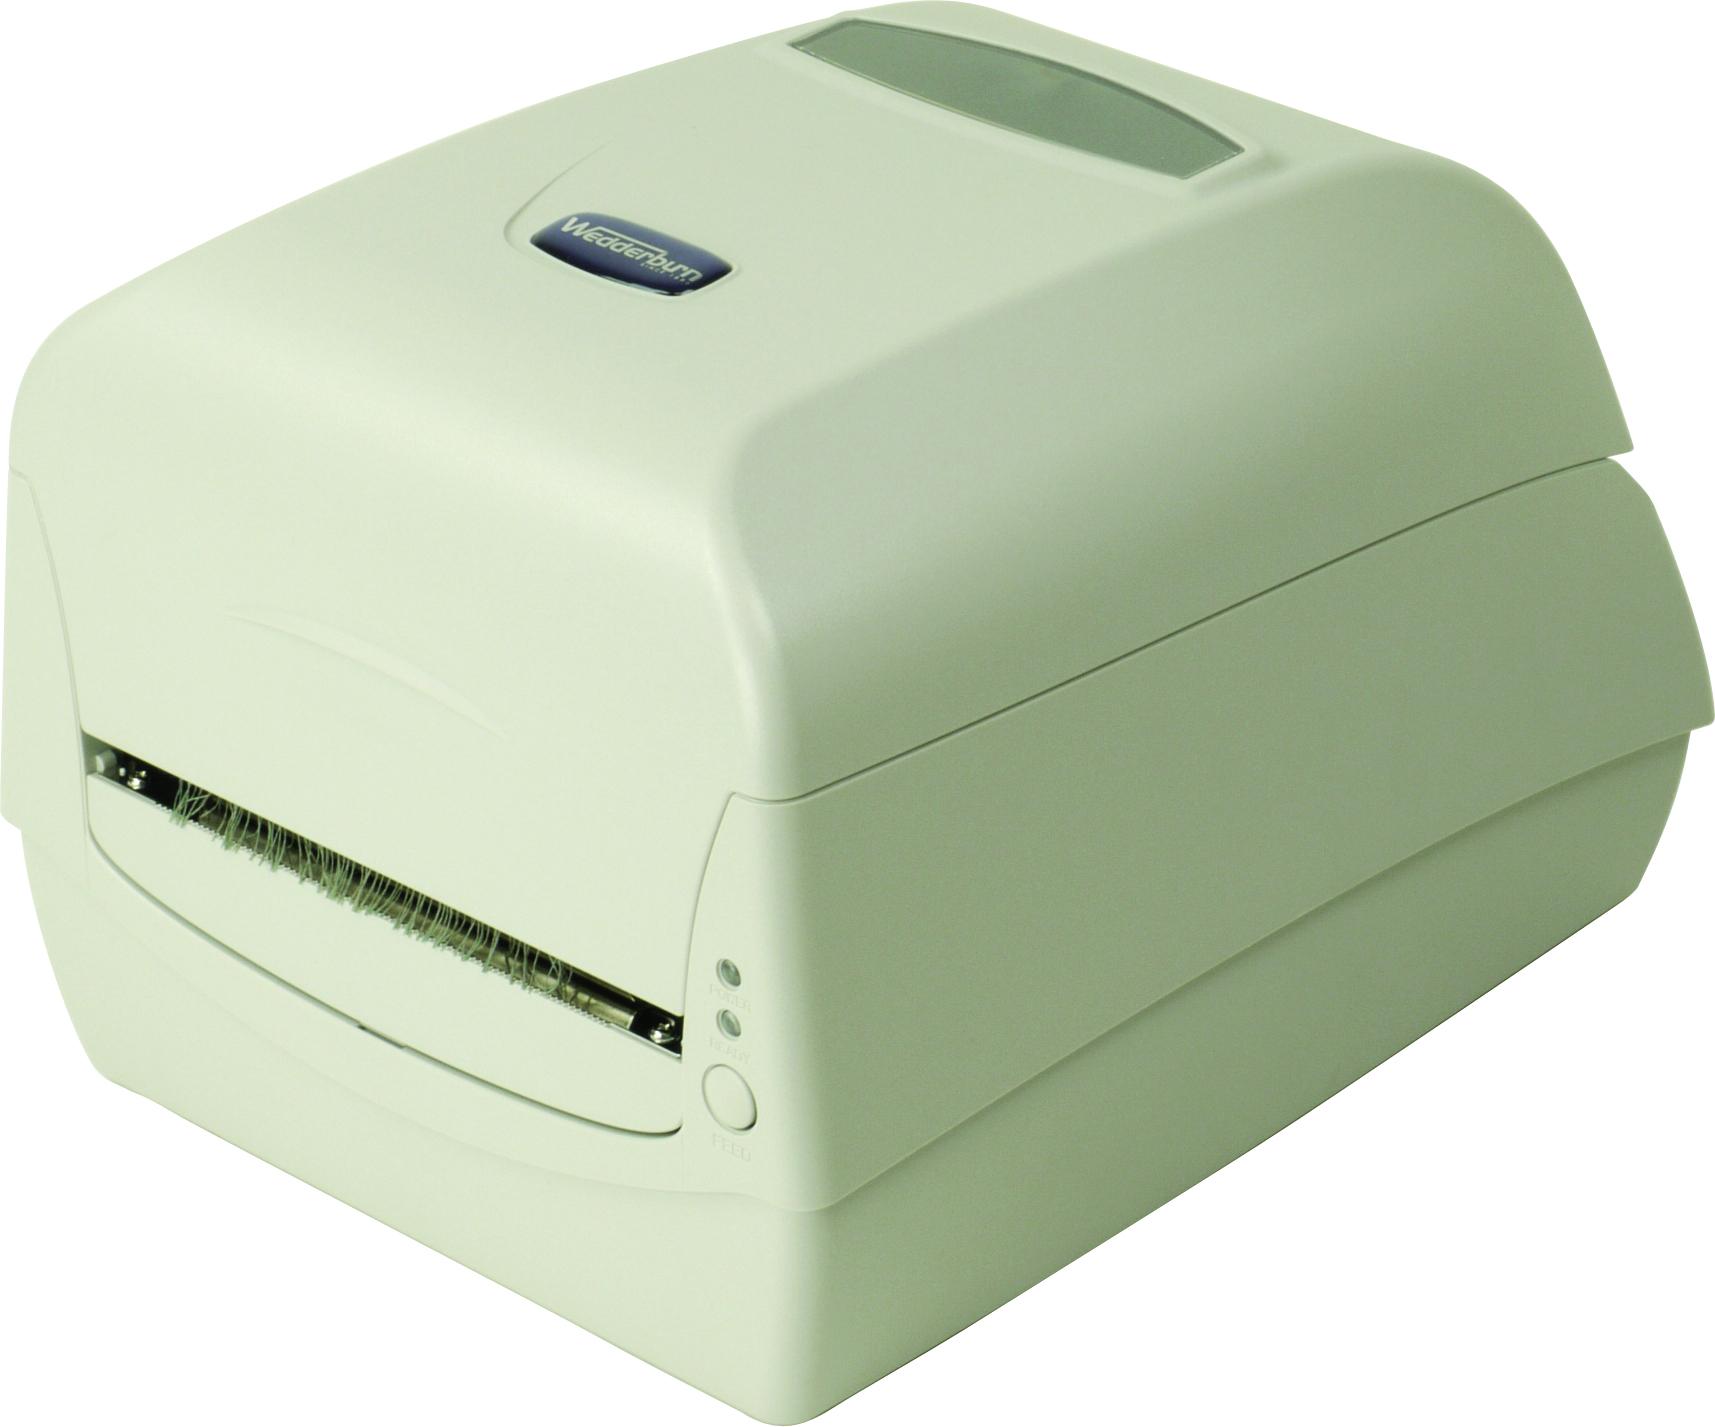 Direct Thermal Transfer Printer